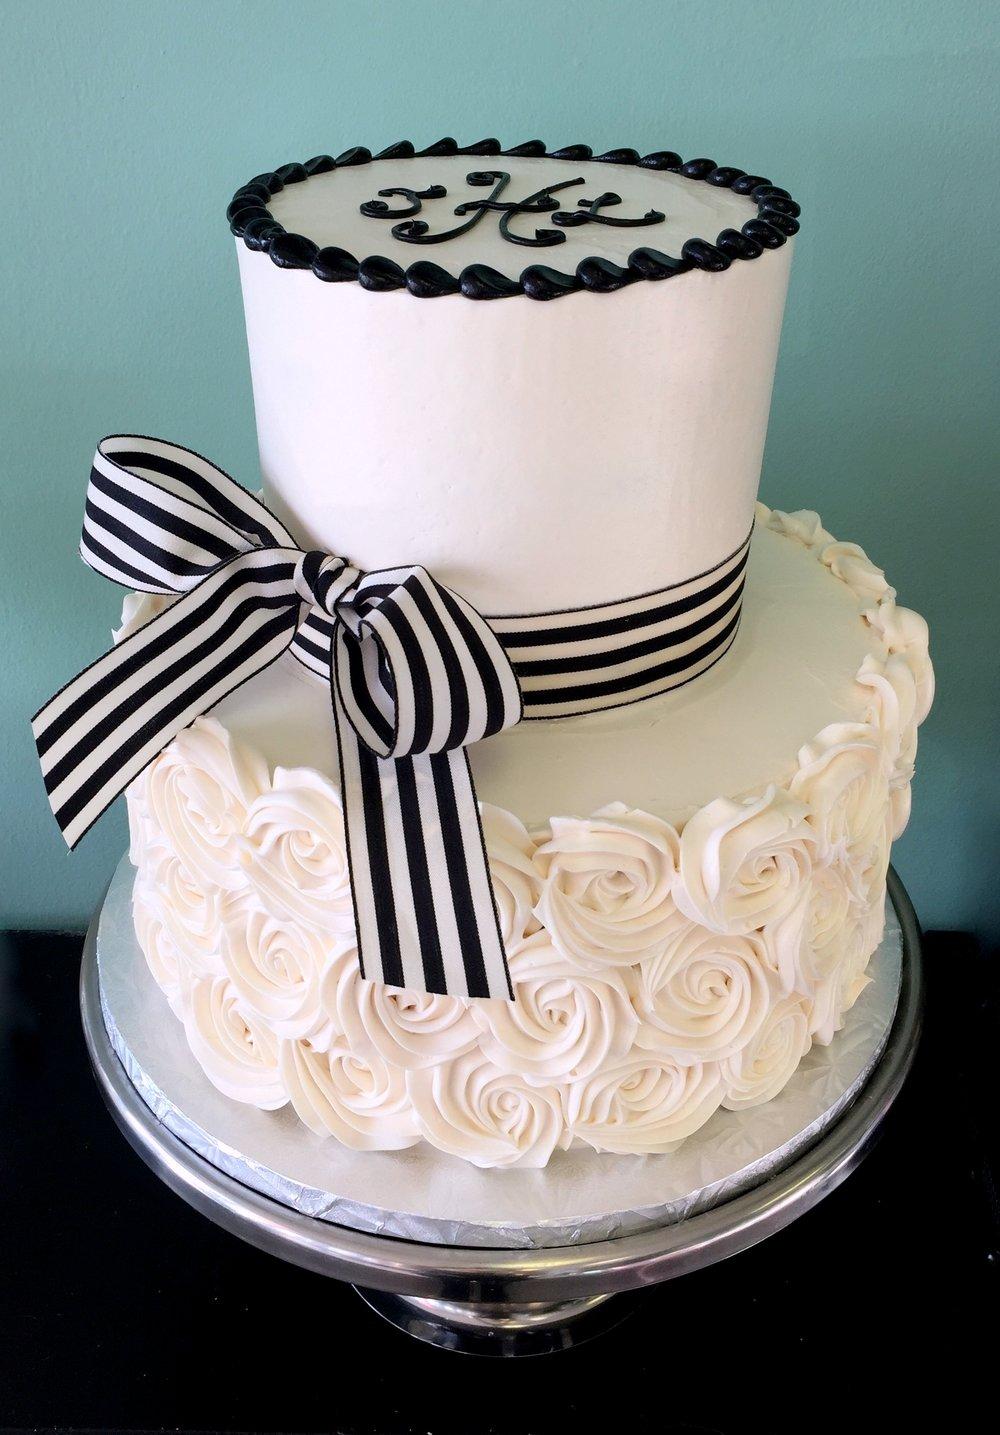 white rosettes and black and white bow cake.JPG